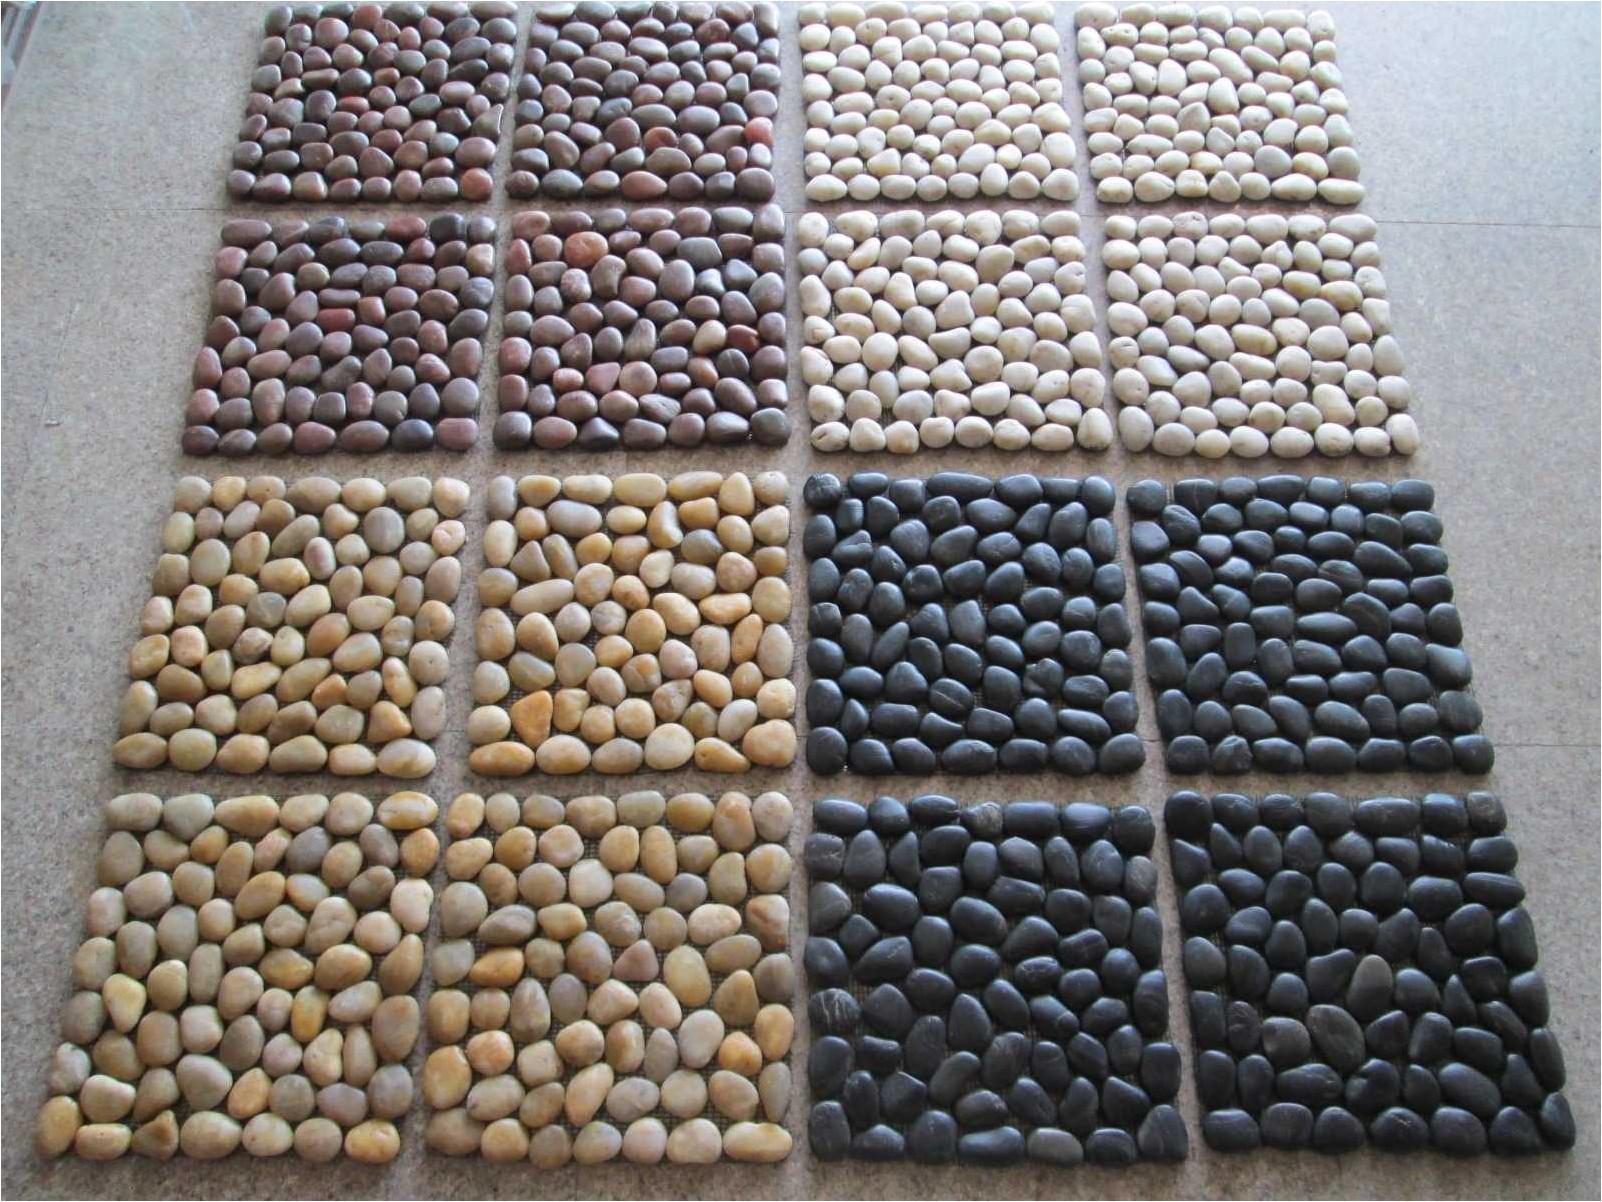 Kiesel Fluss Natur Stein Mosaik Fliesen